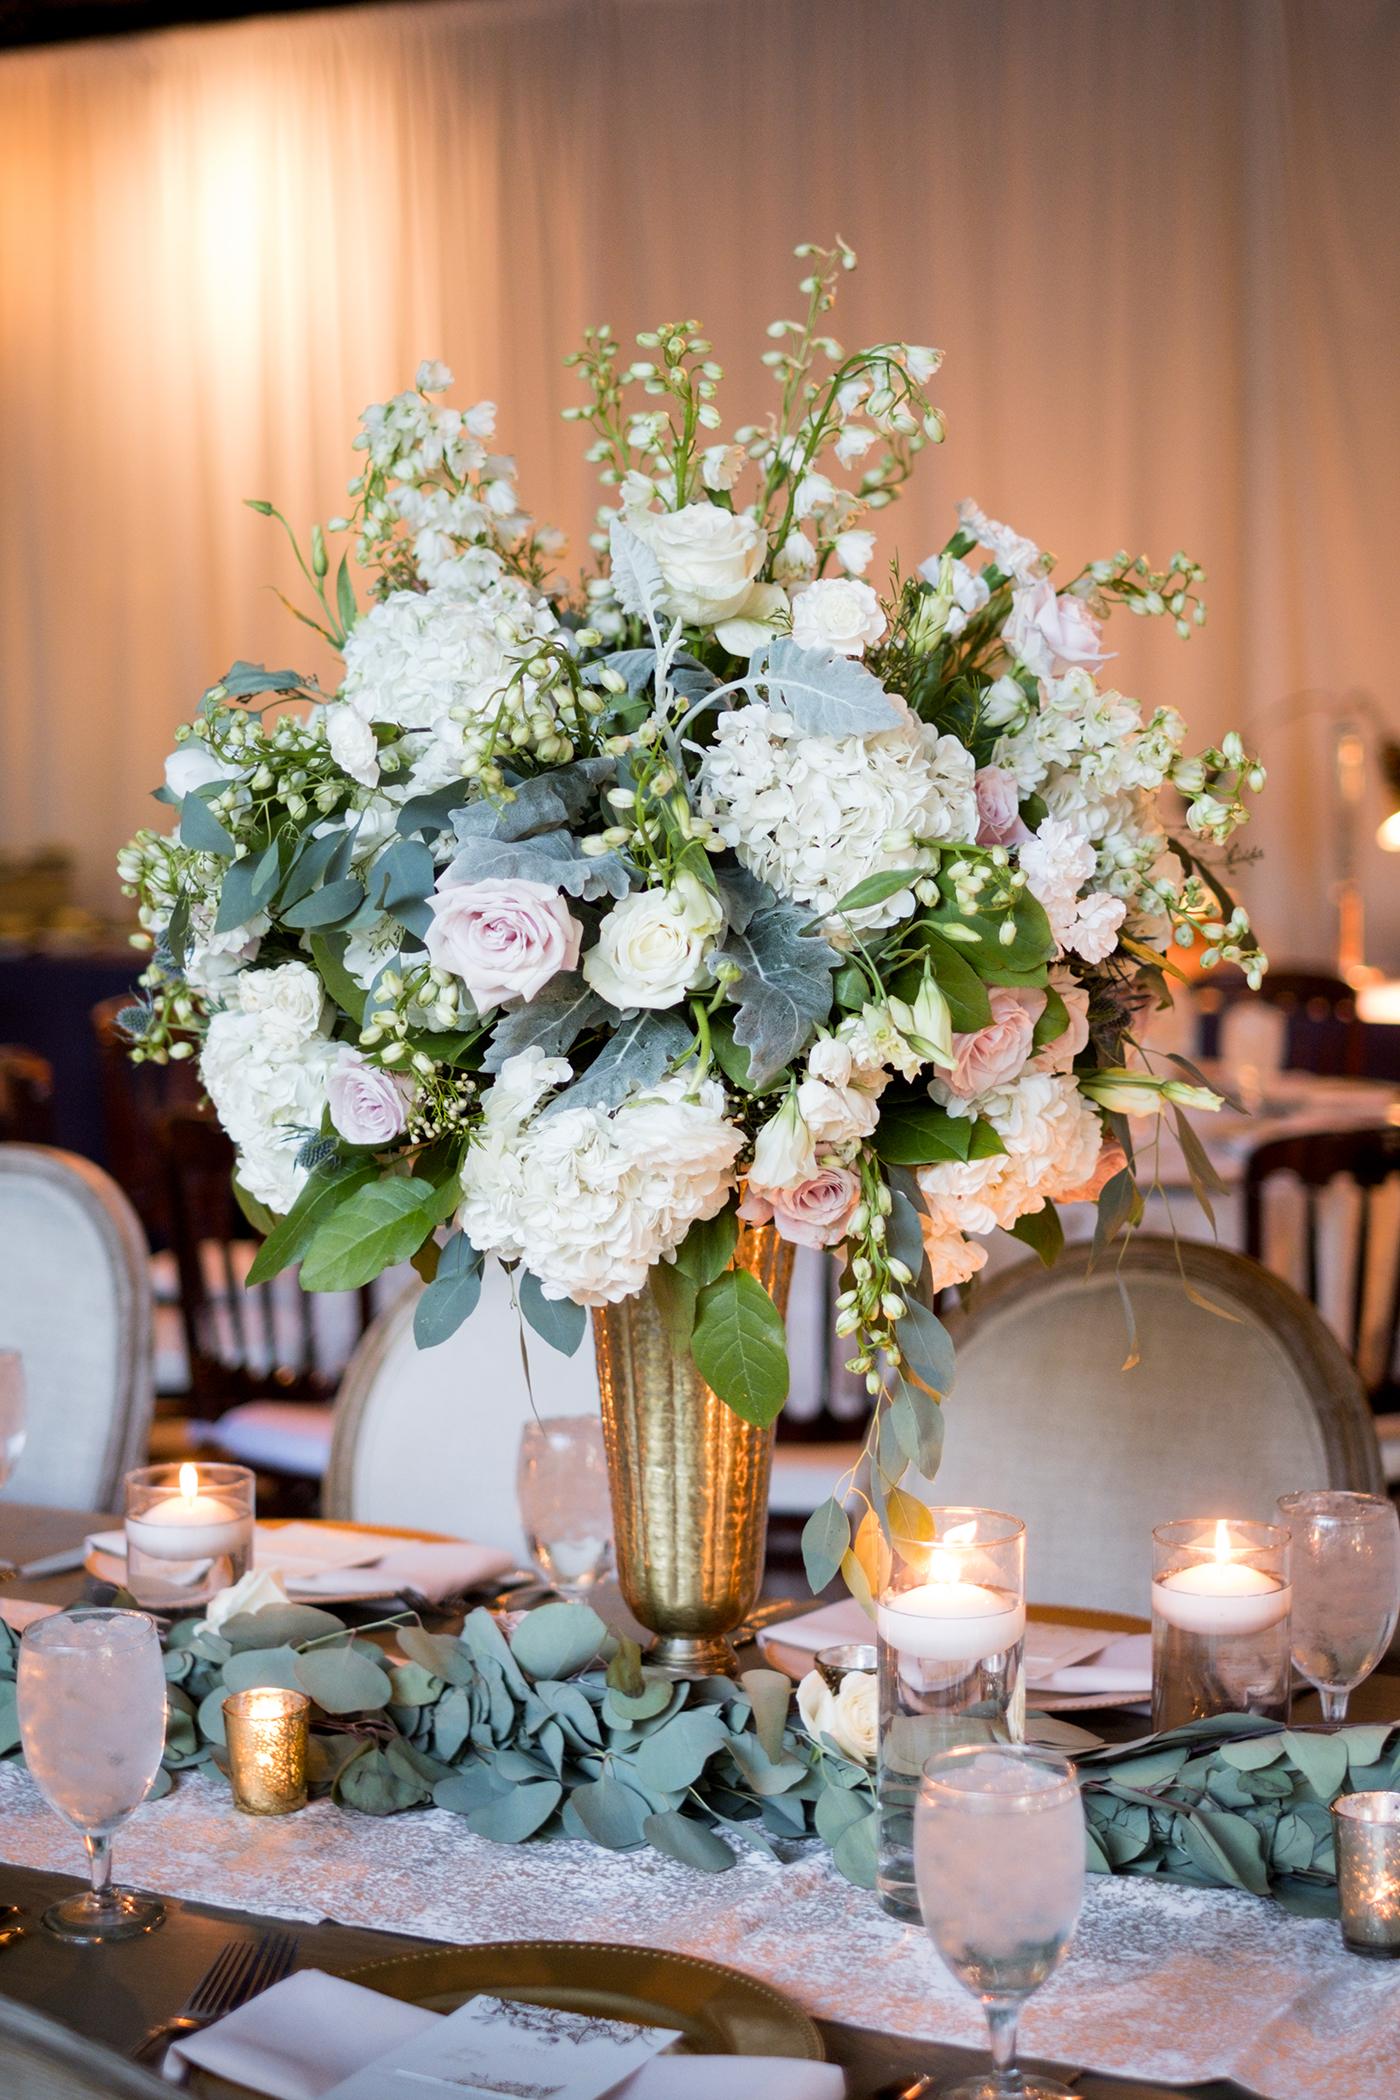 Wedding Planner Dallas TX - Allday Events - Highland Park - Marie Gabrielle Wedding - 58.jpg